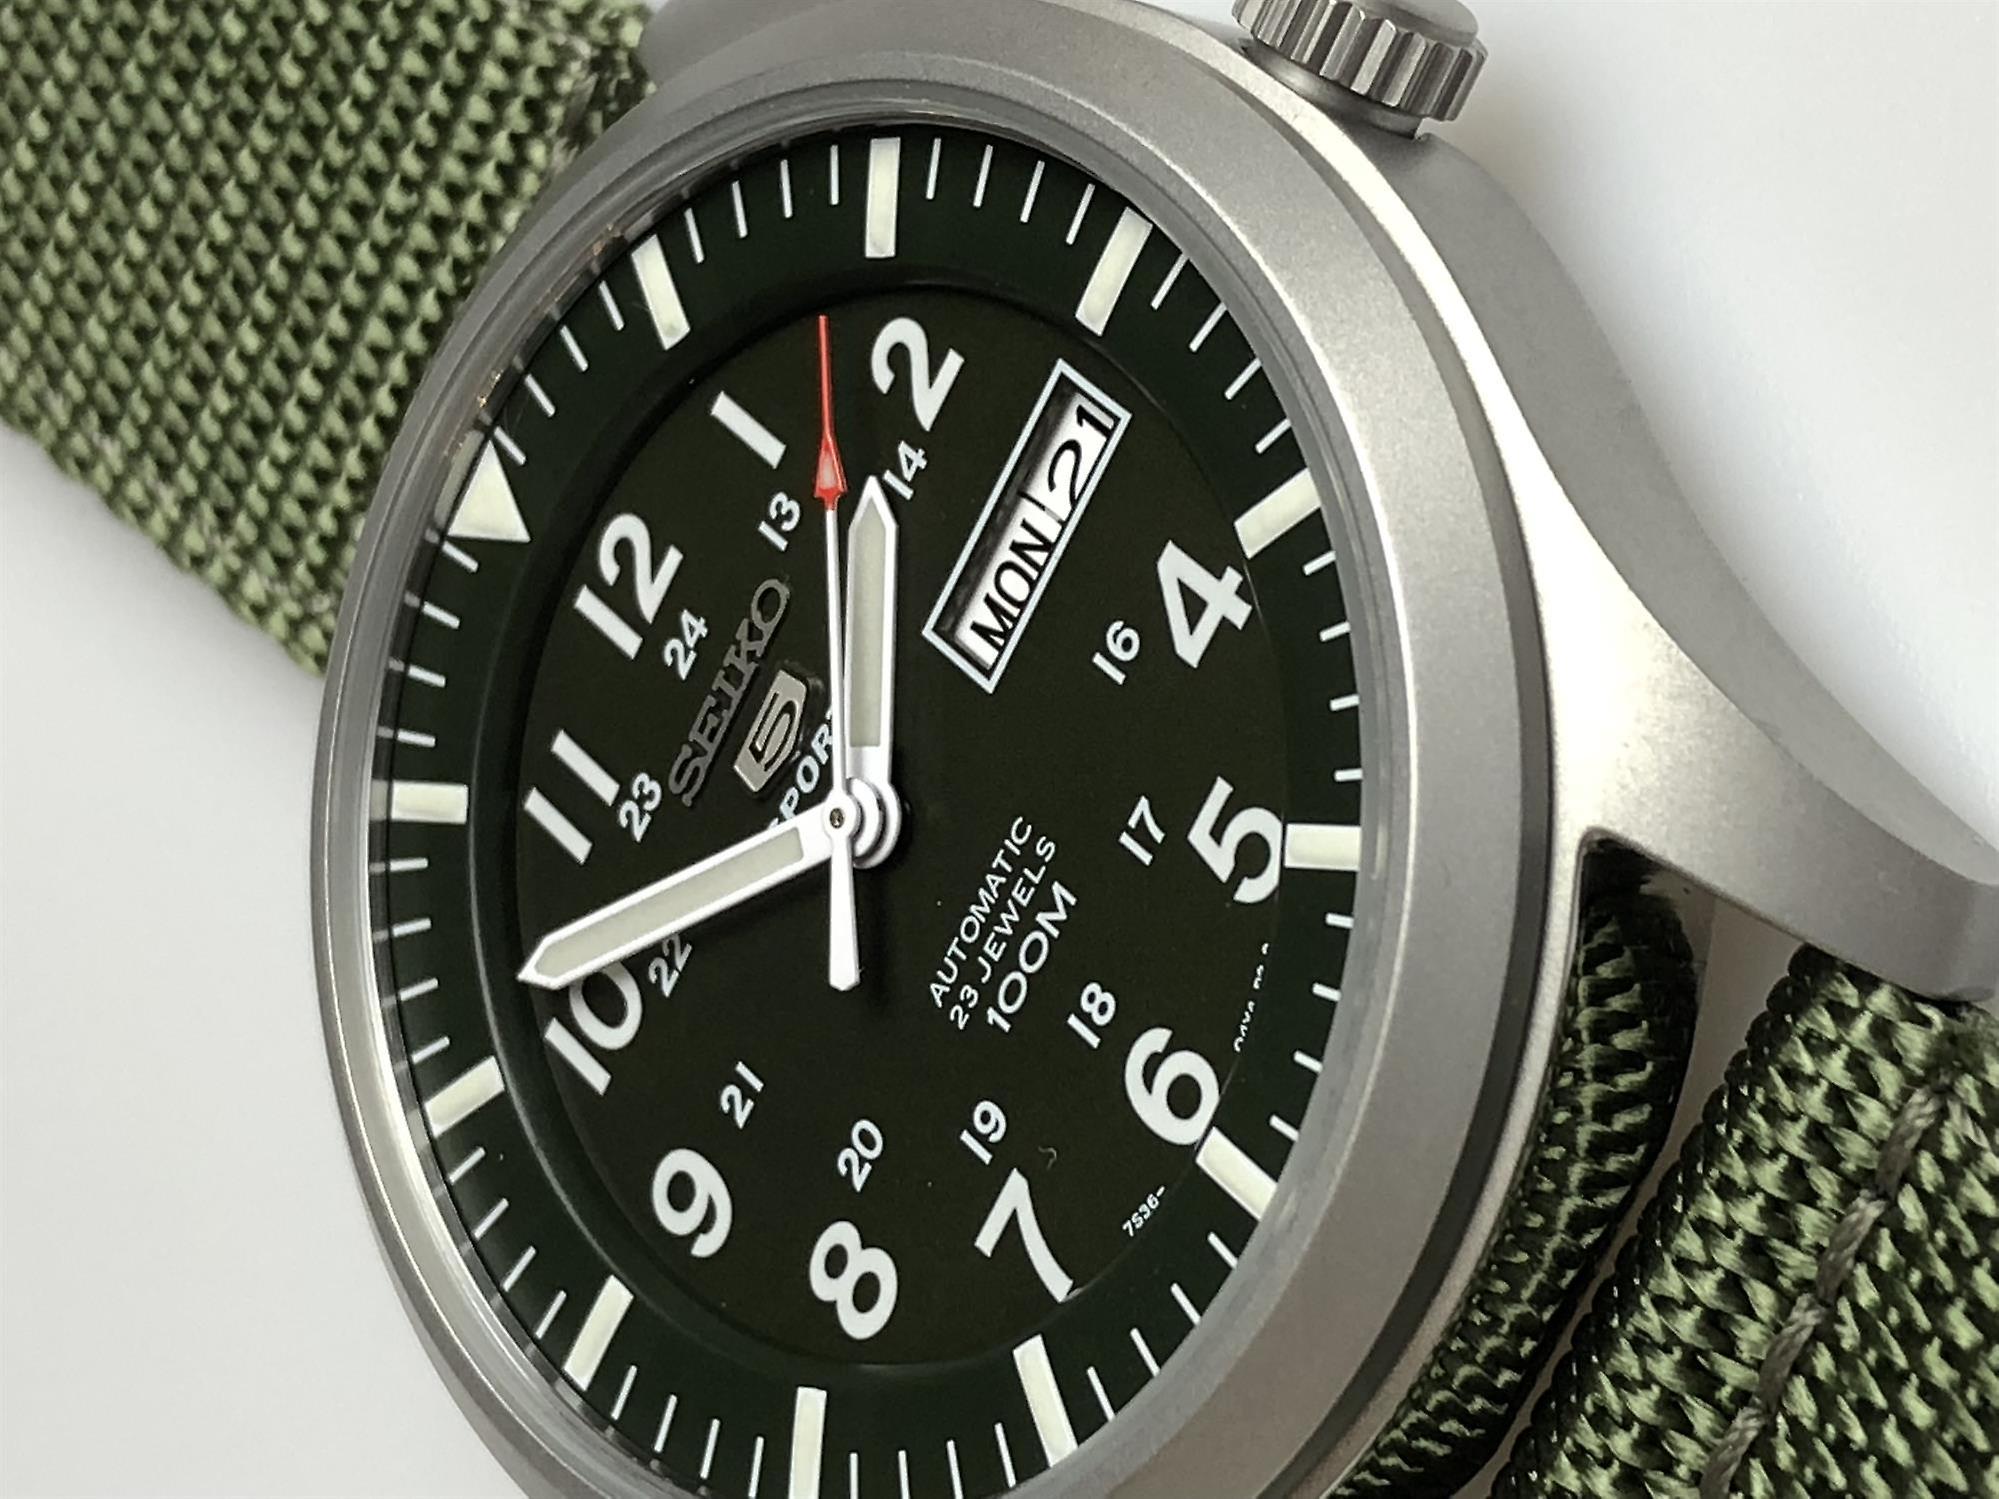 Seiko 5 Sports Automatic Khaki Green Military Style Men's Watch SNZG09K1